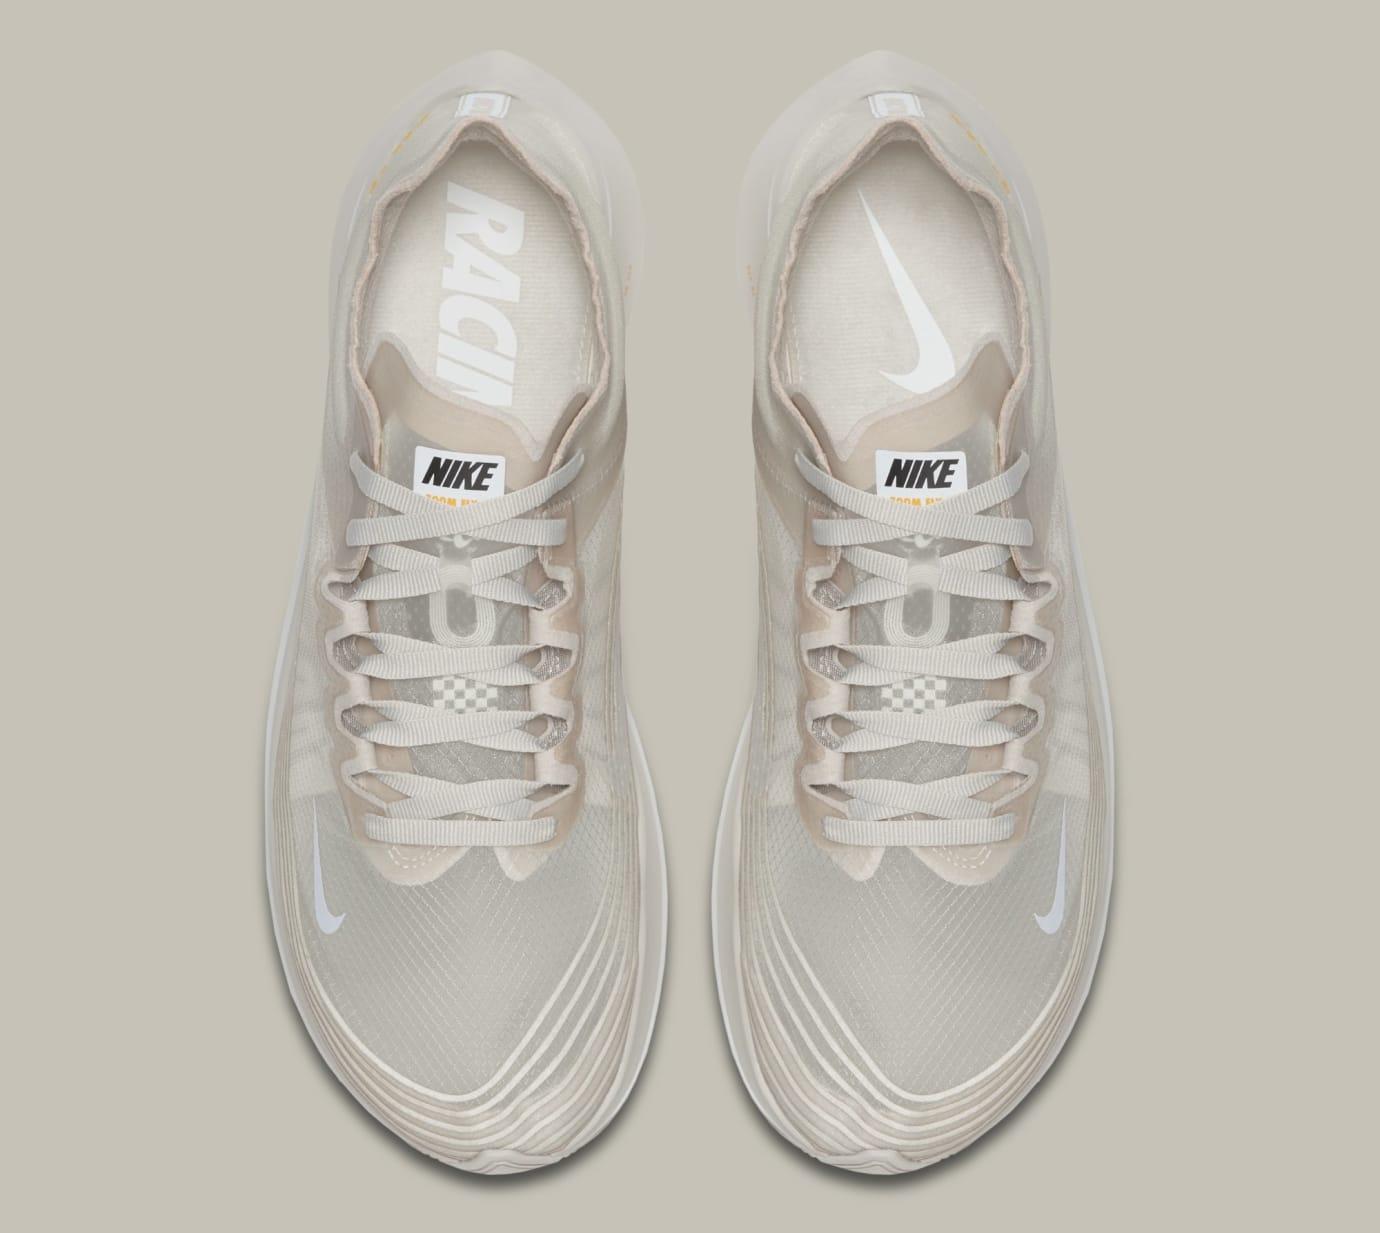 Nike Zoom Fly SP 'Light Bone' AJ9282-001 (Top)